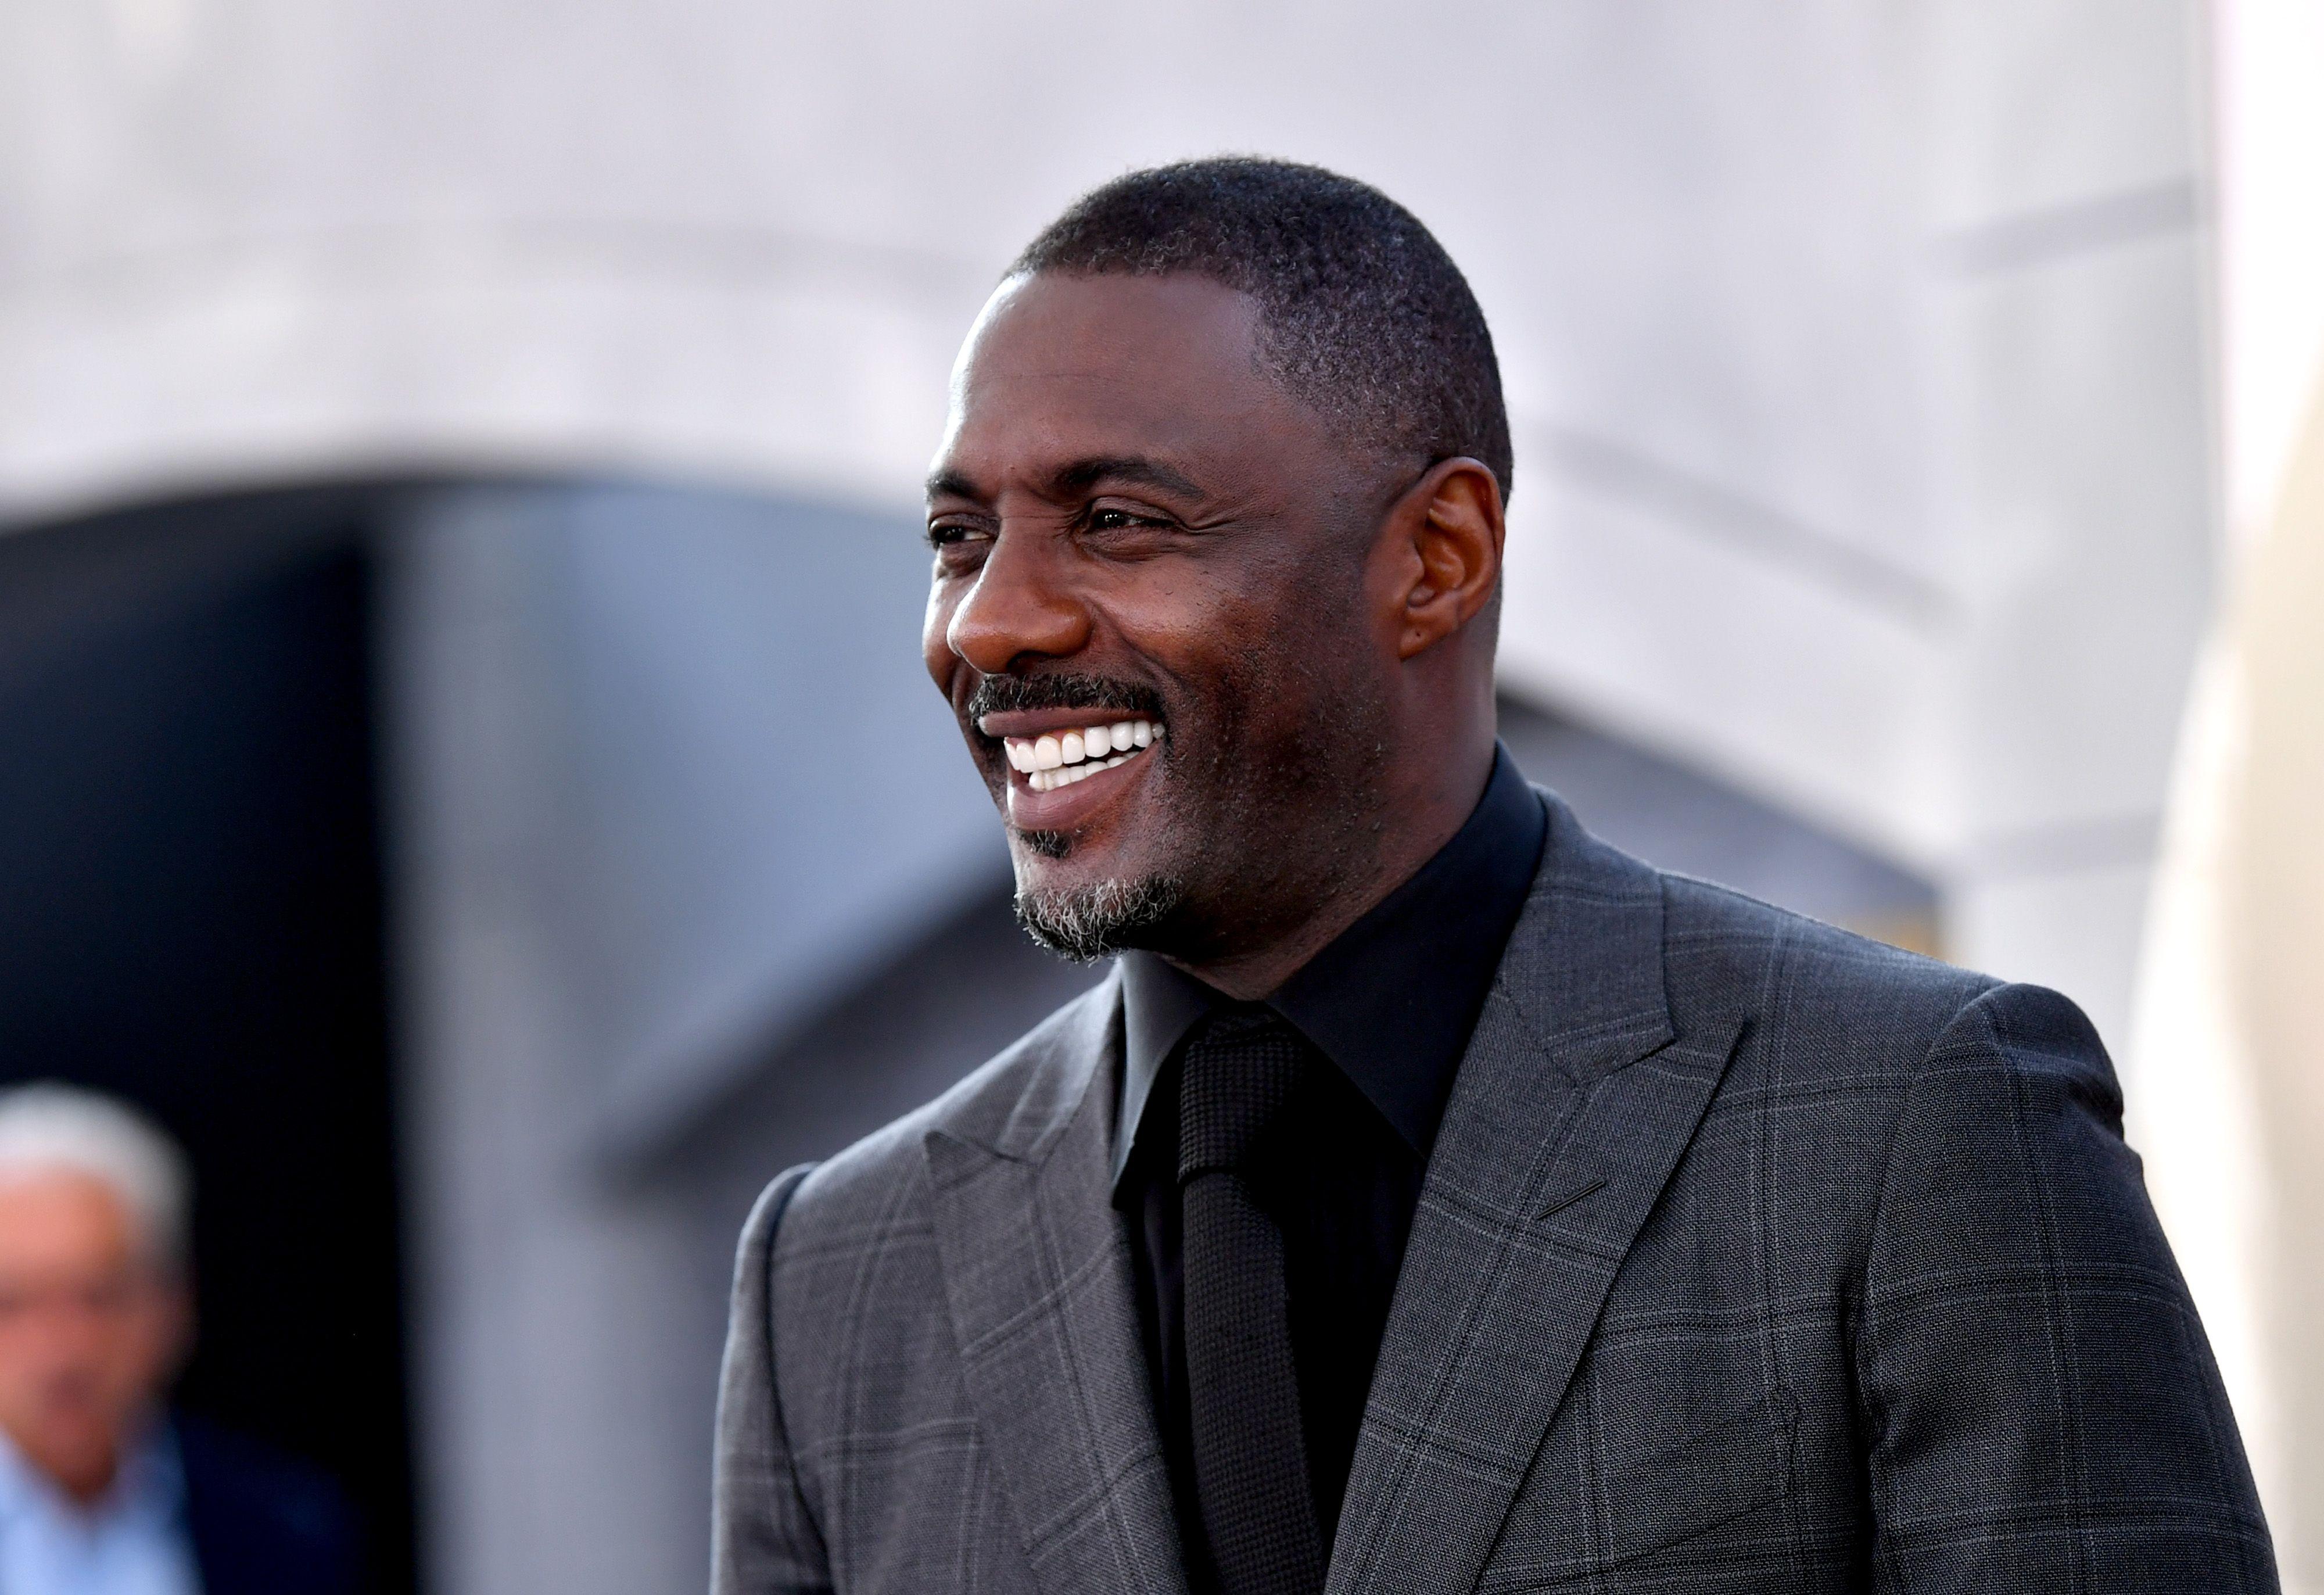 Idris Elba poses for a photo.